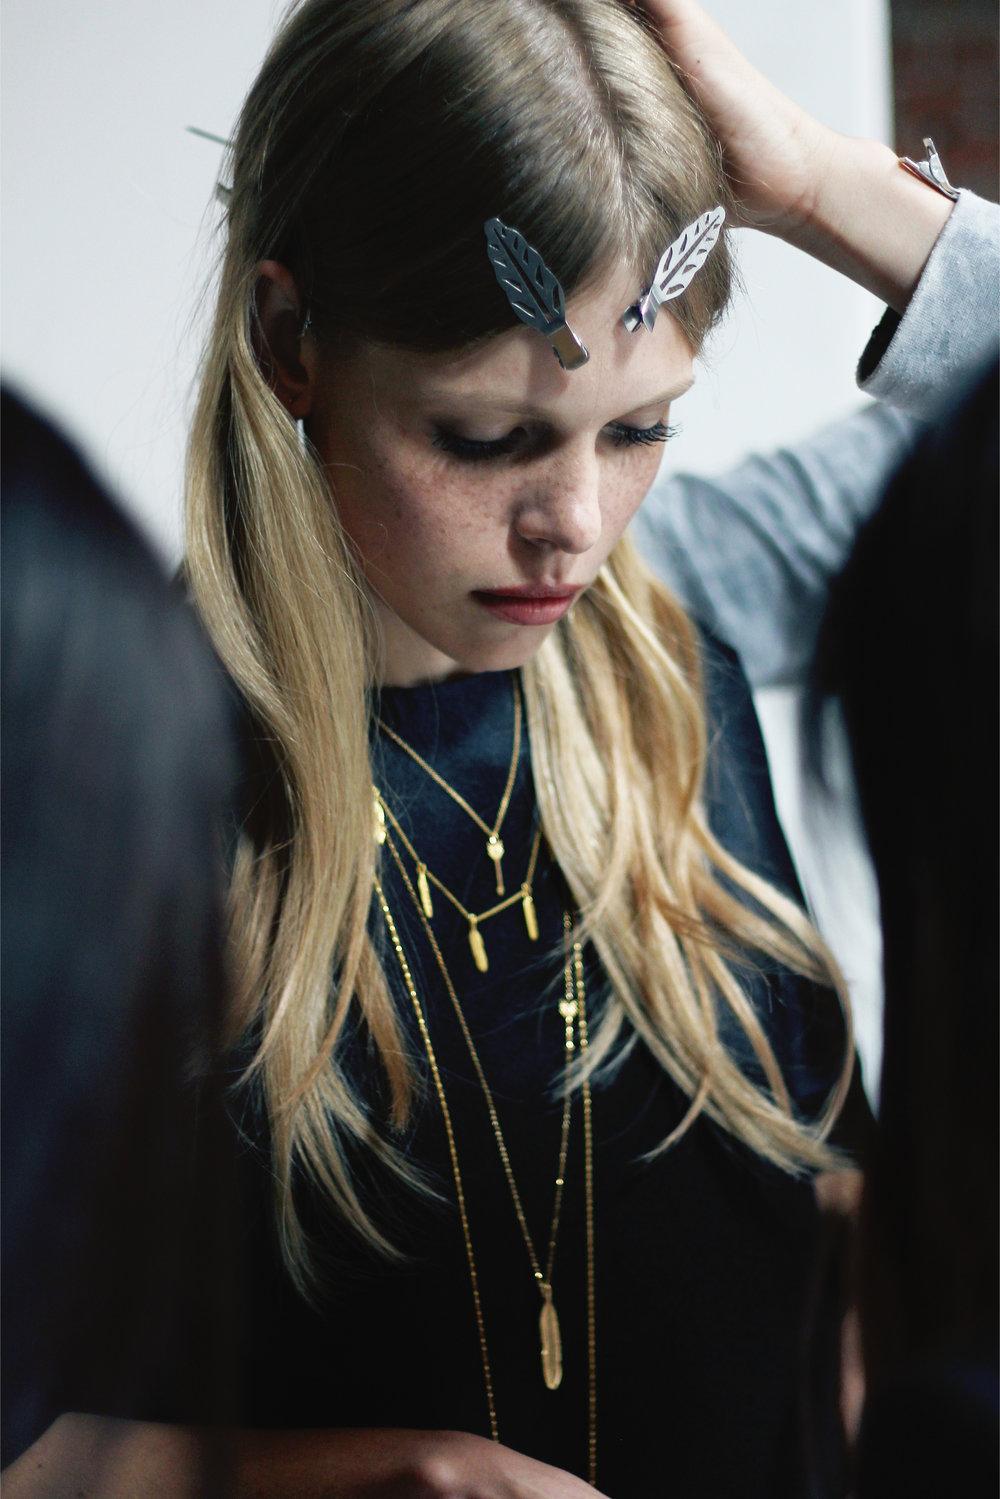 Adorngirl Photography 3.jpg